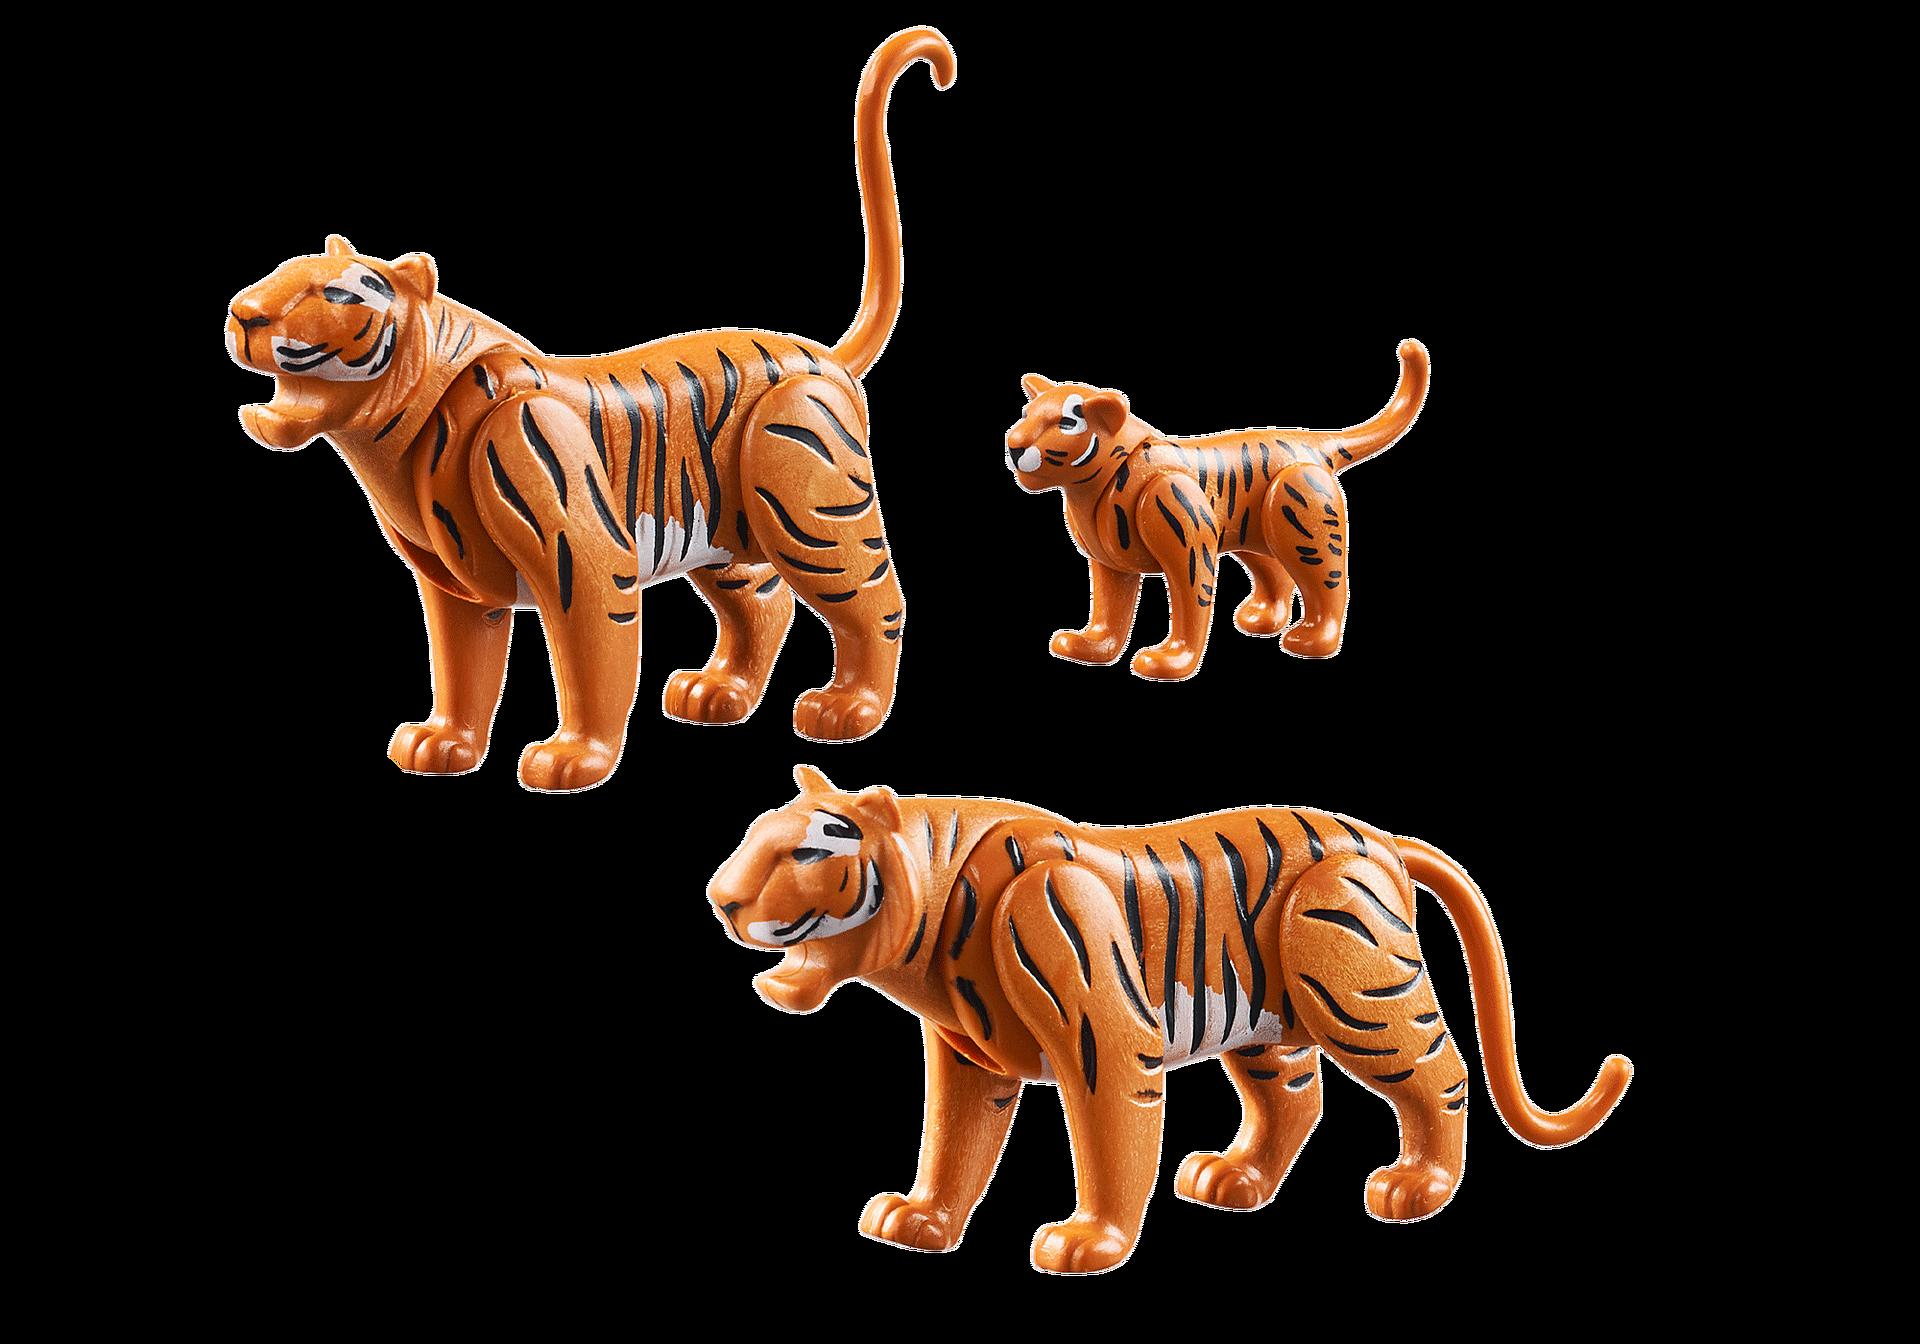 70359 Tygrysy zoom image3